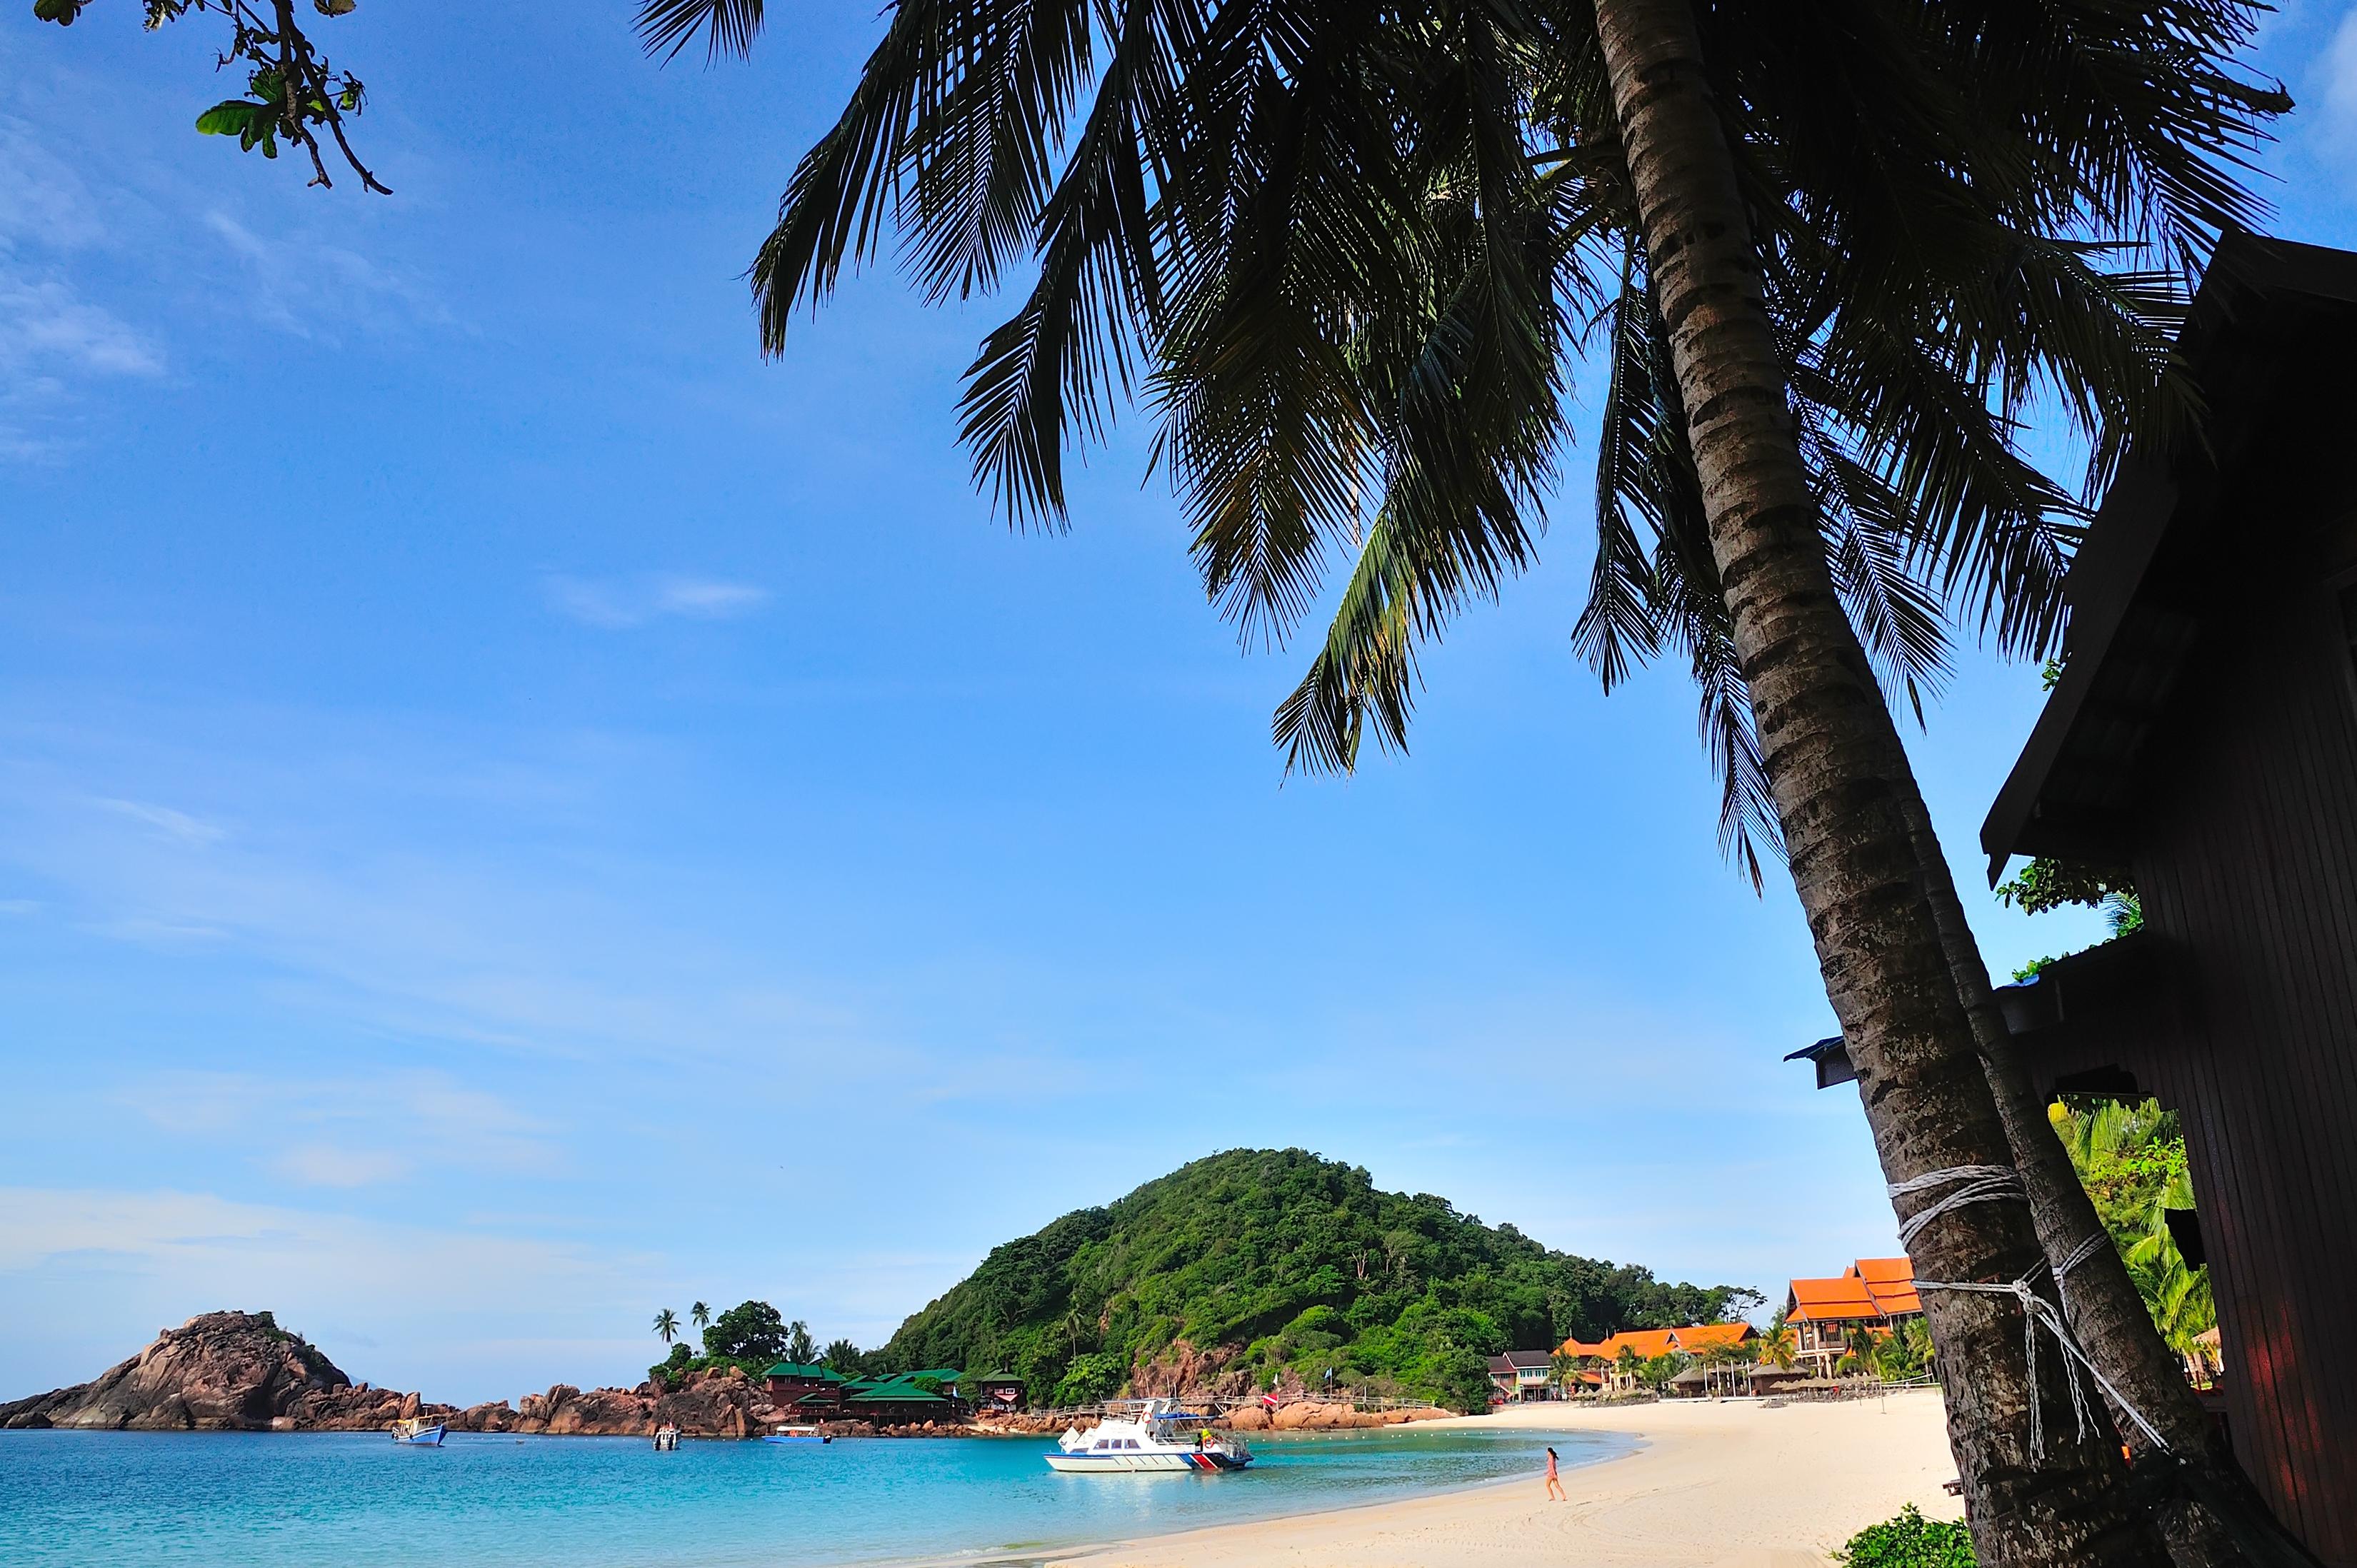 Pulau Redang Marine Park